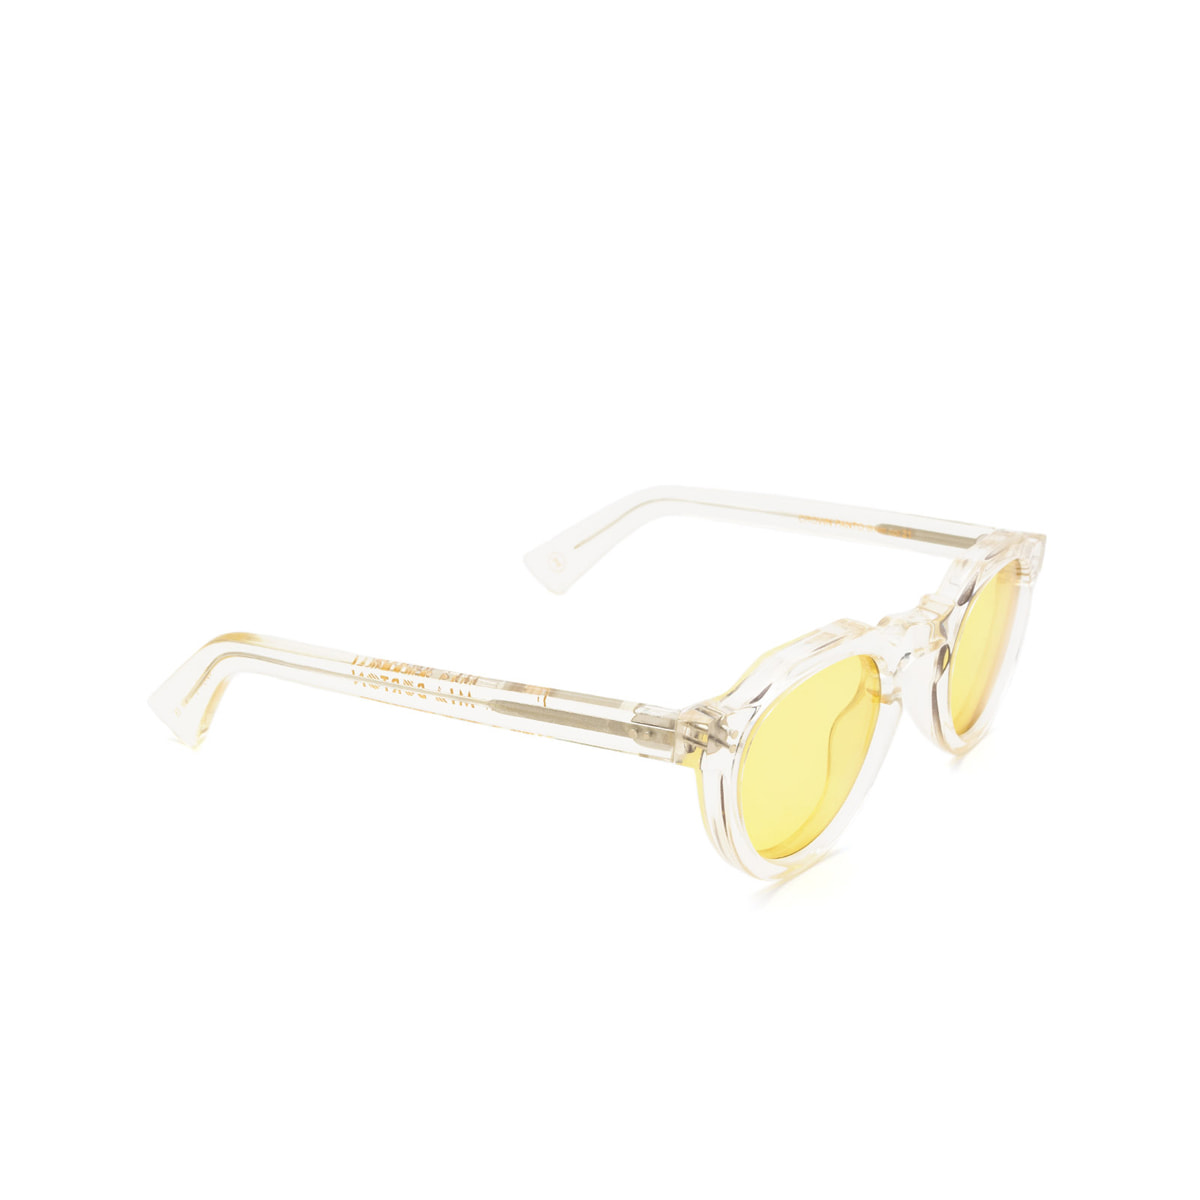 Lesca® Irregular Sunglasses: Crown Panto X Mia Burton color 21 - JOYFUL YELLOW.